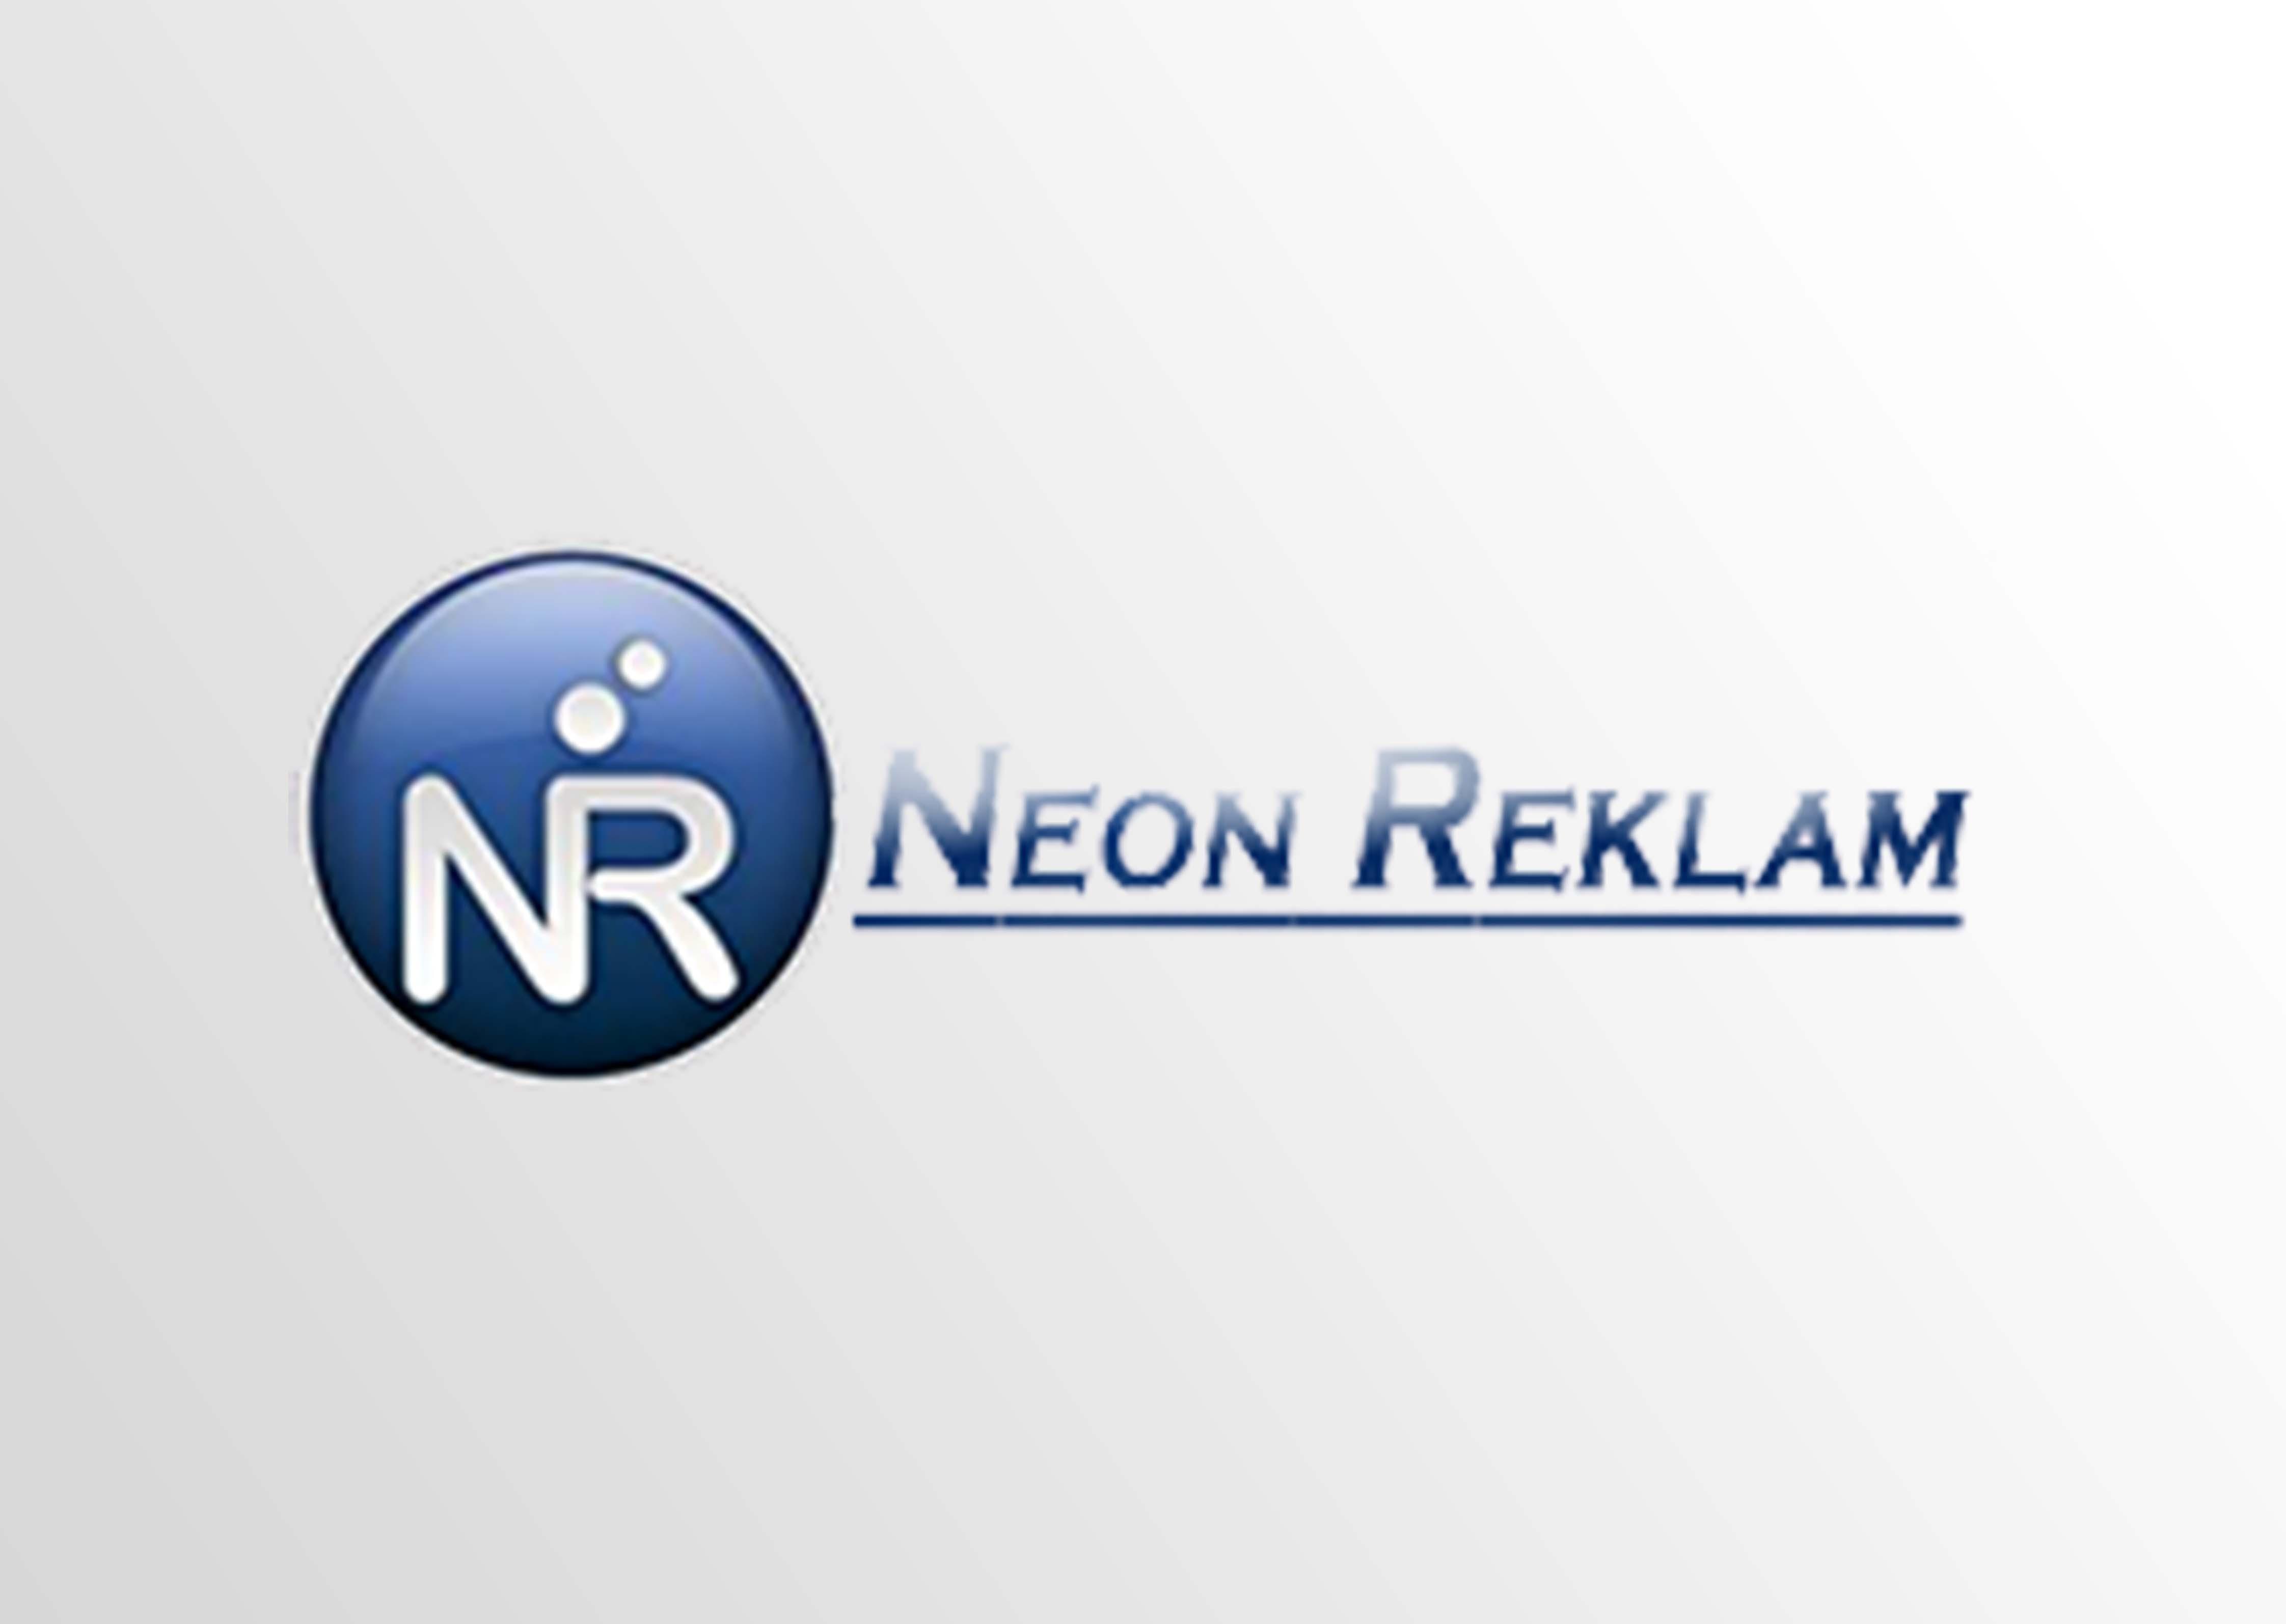 neoncu.com